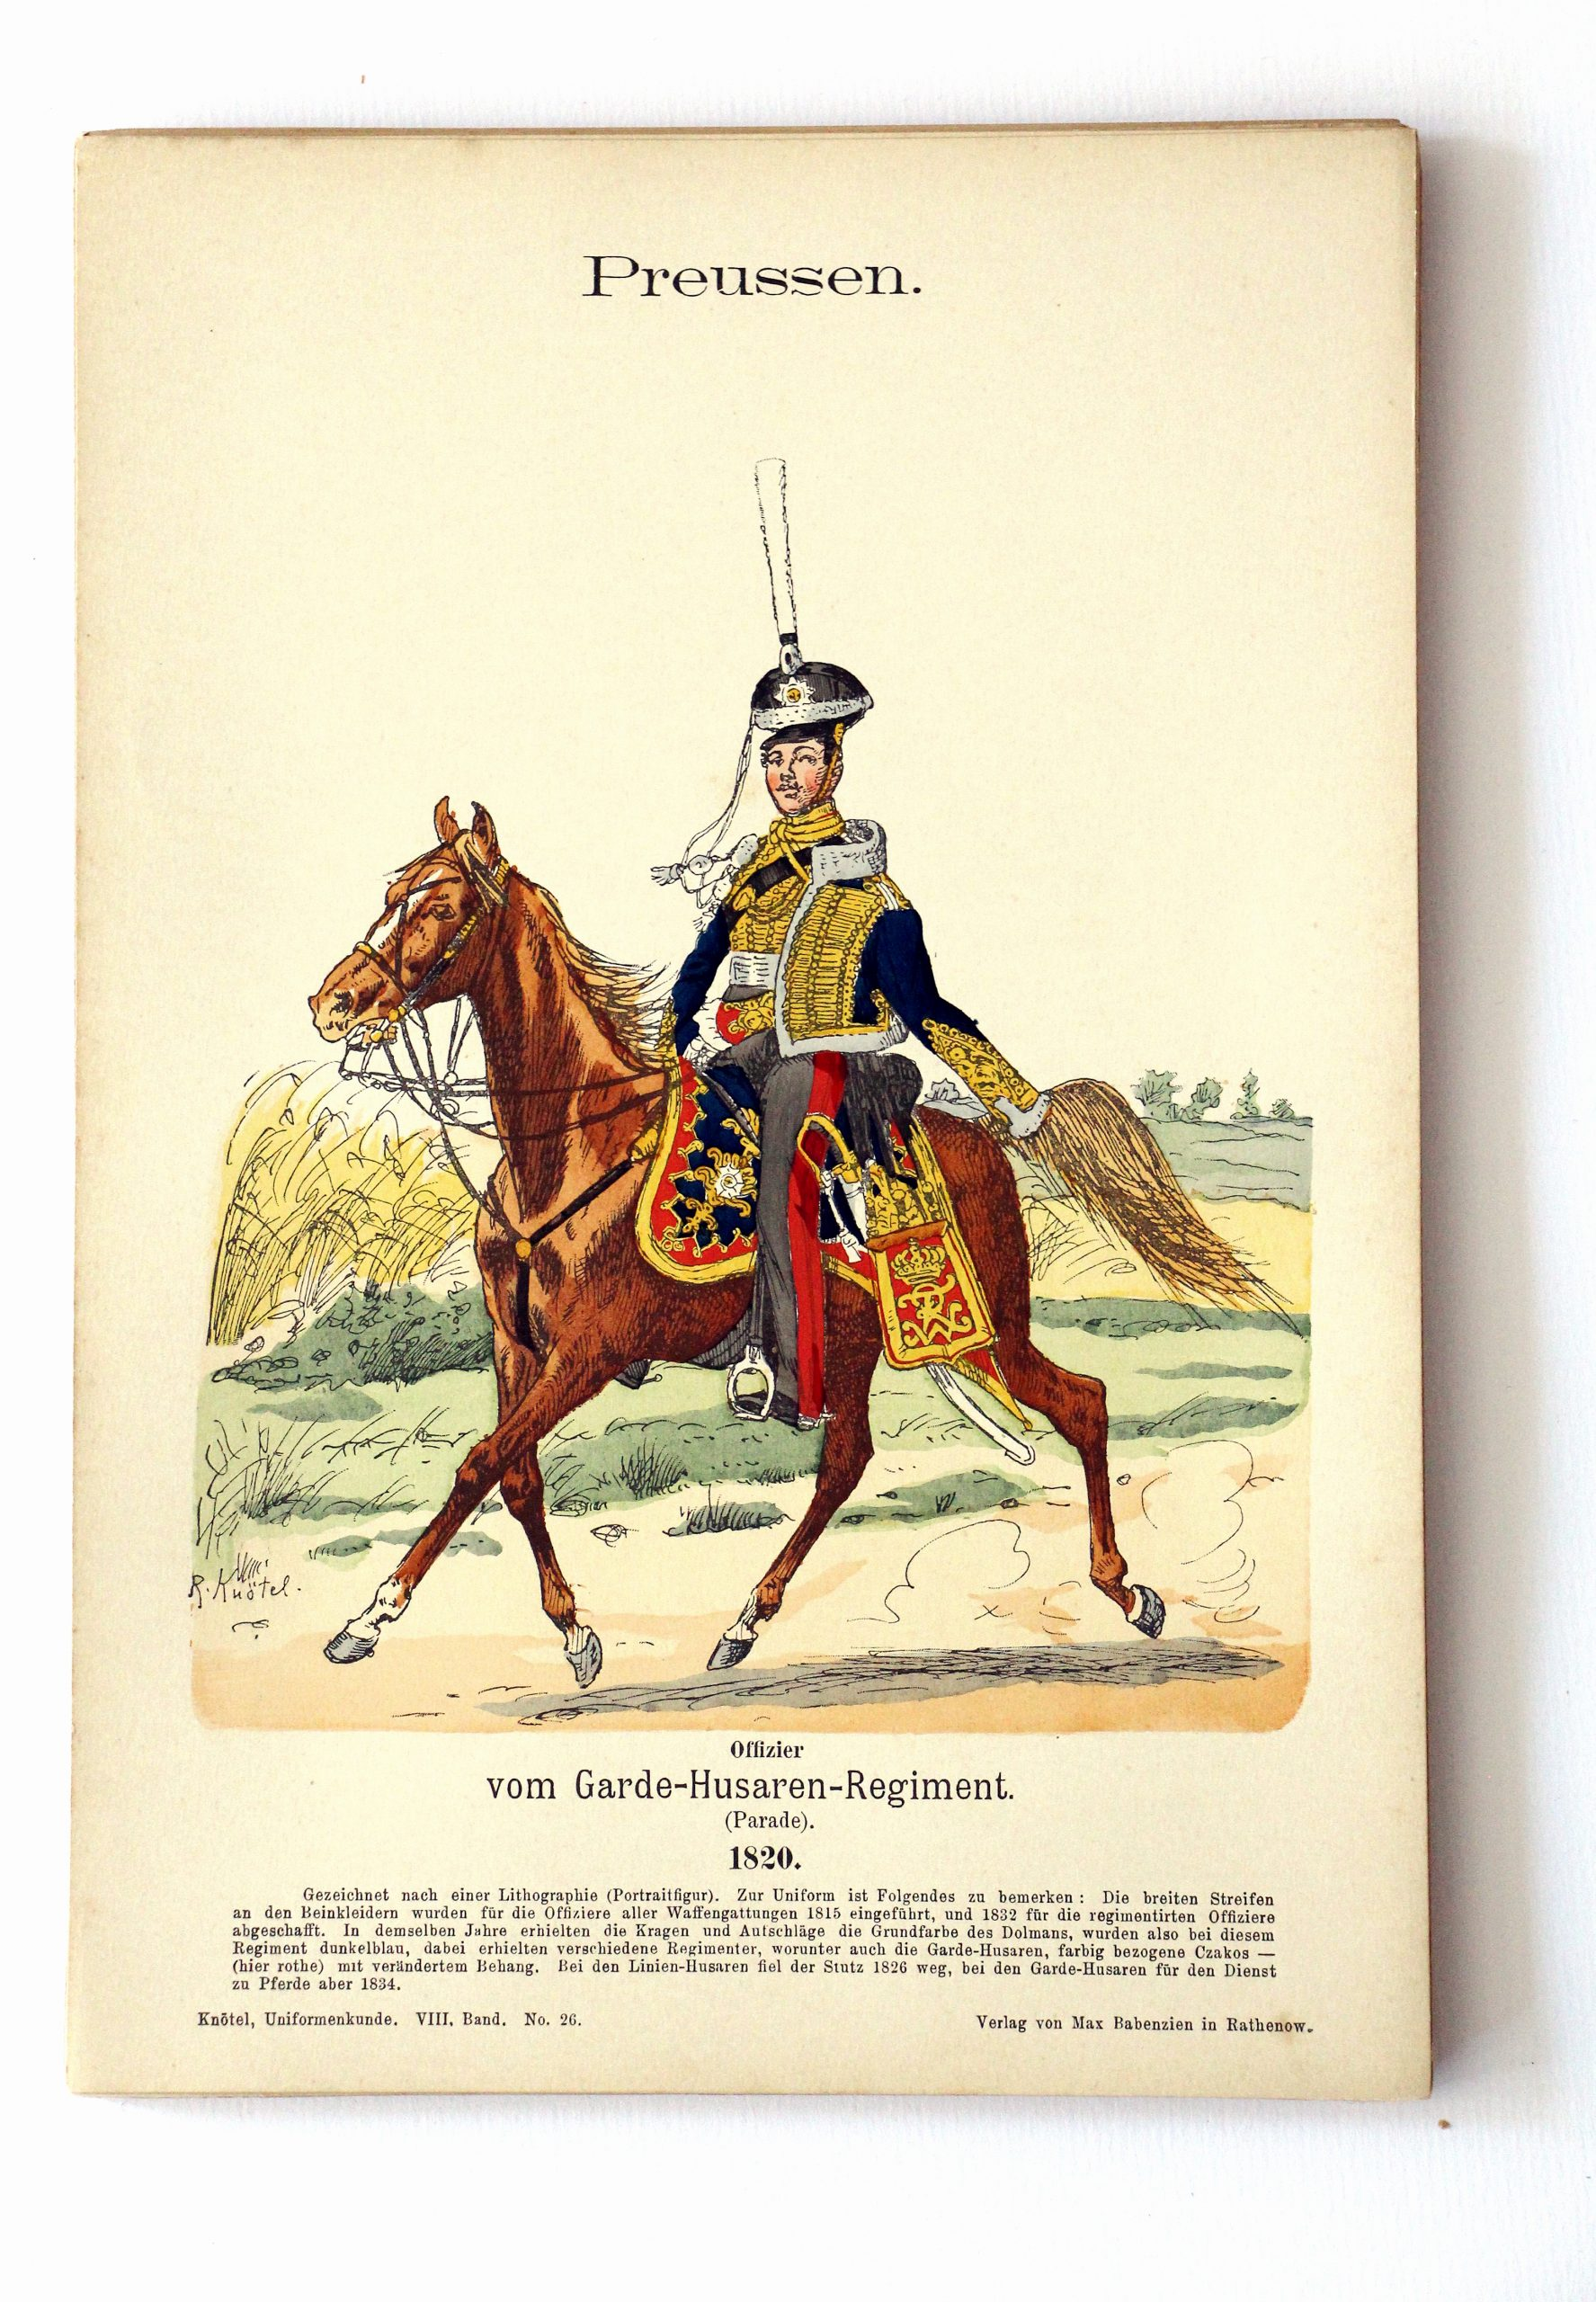 Preussen - Uniformenkunde - Richard Knoetel - VIII - Planche 26